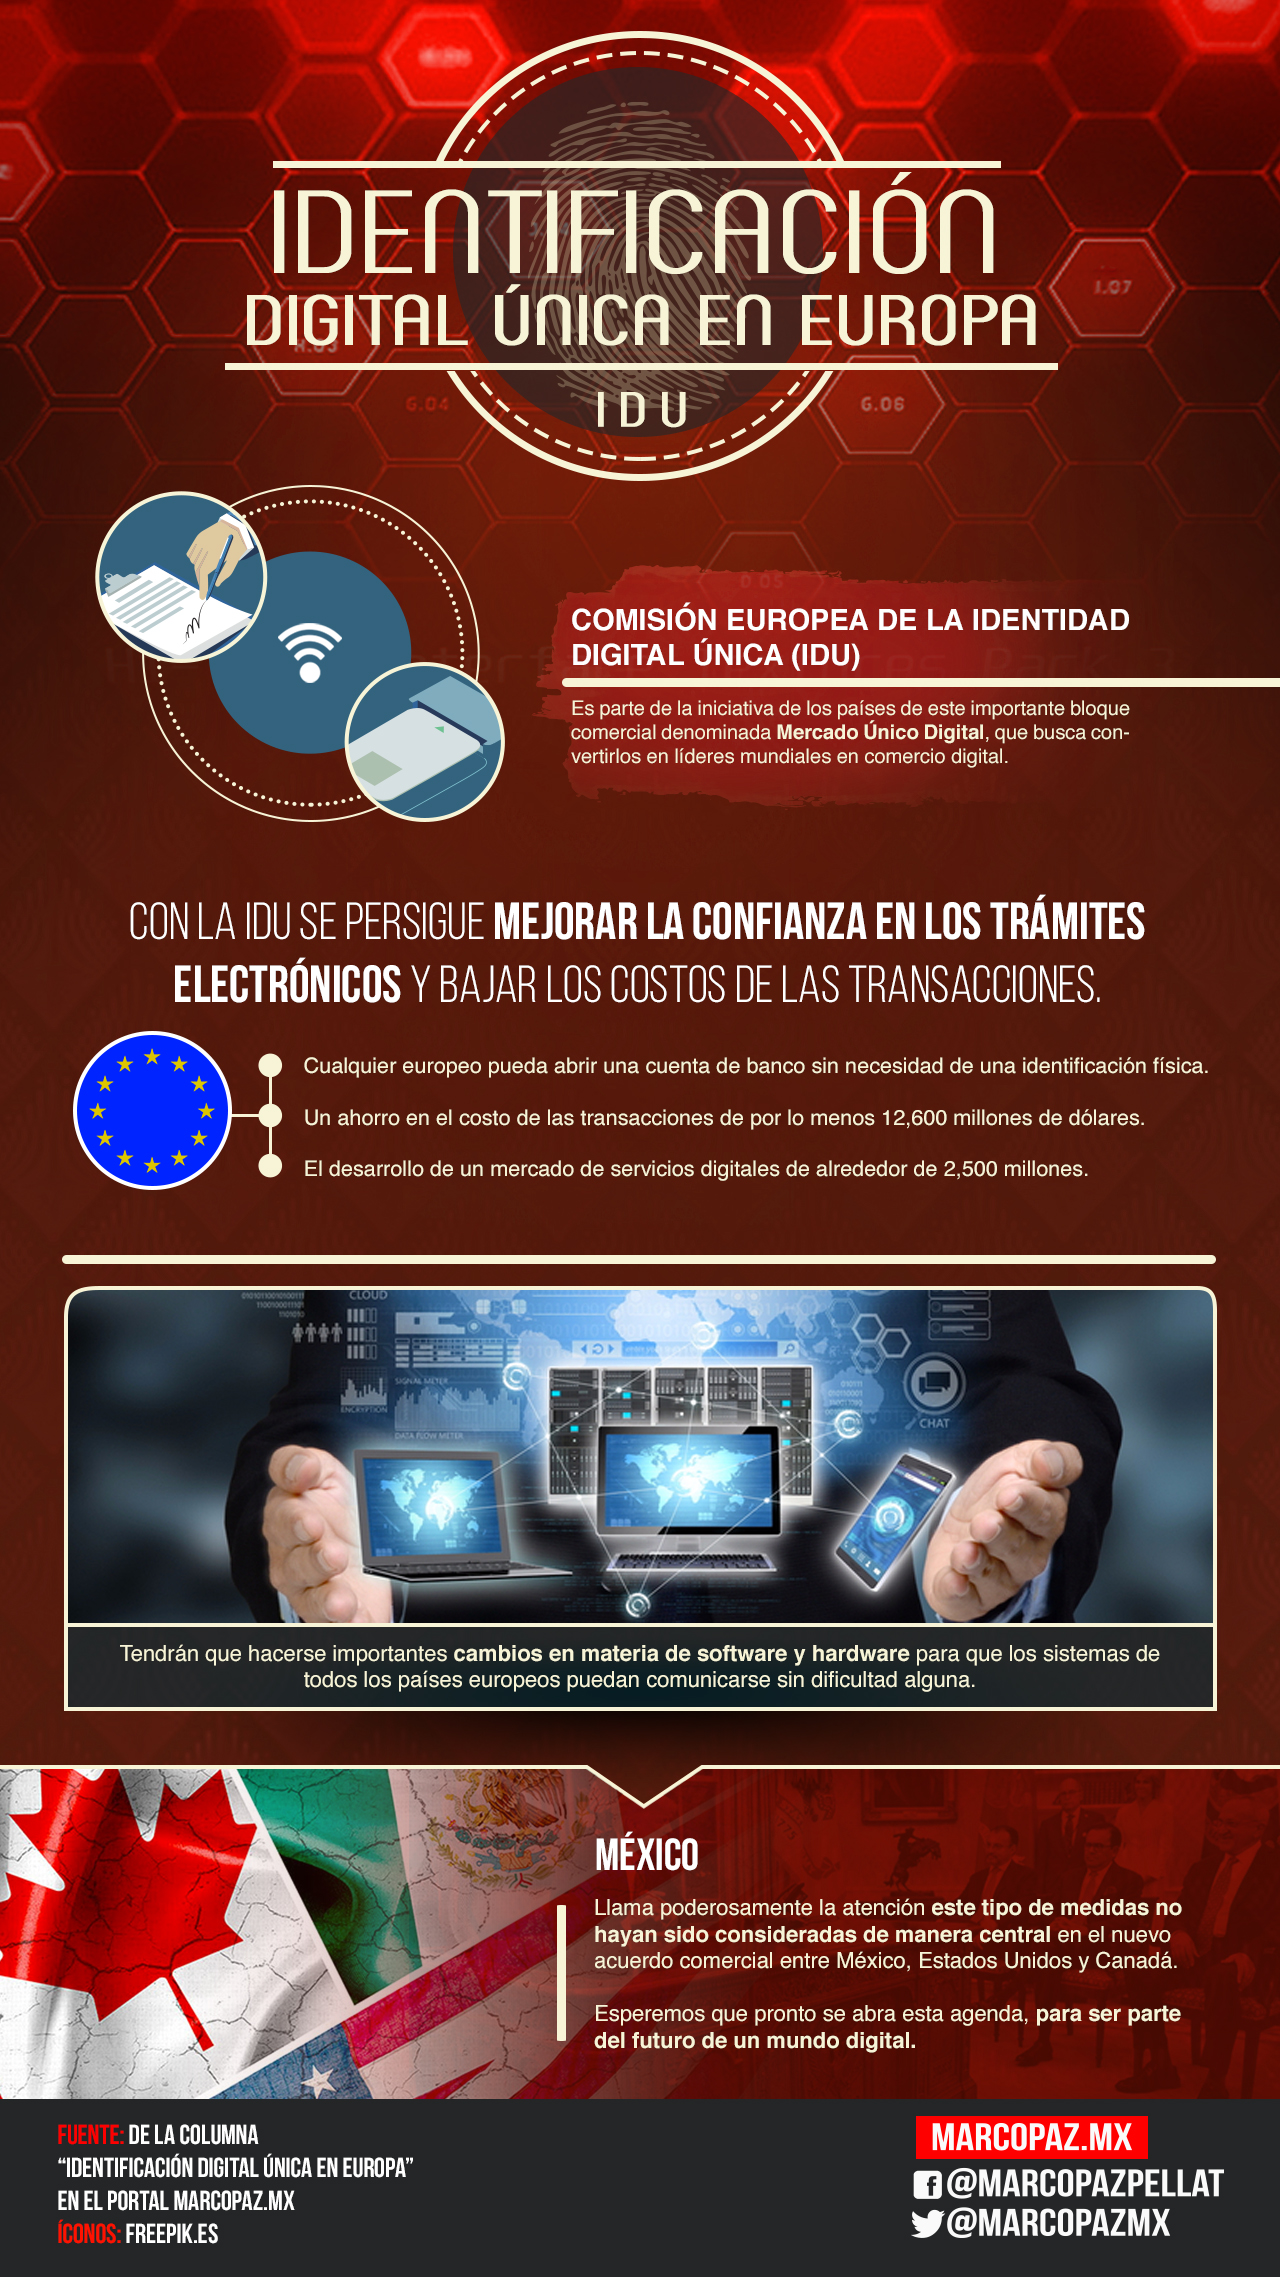 058_INFOGRAFIA_Identificación Digital Única en Europa copy